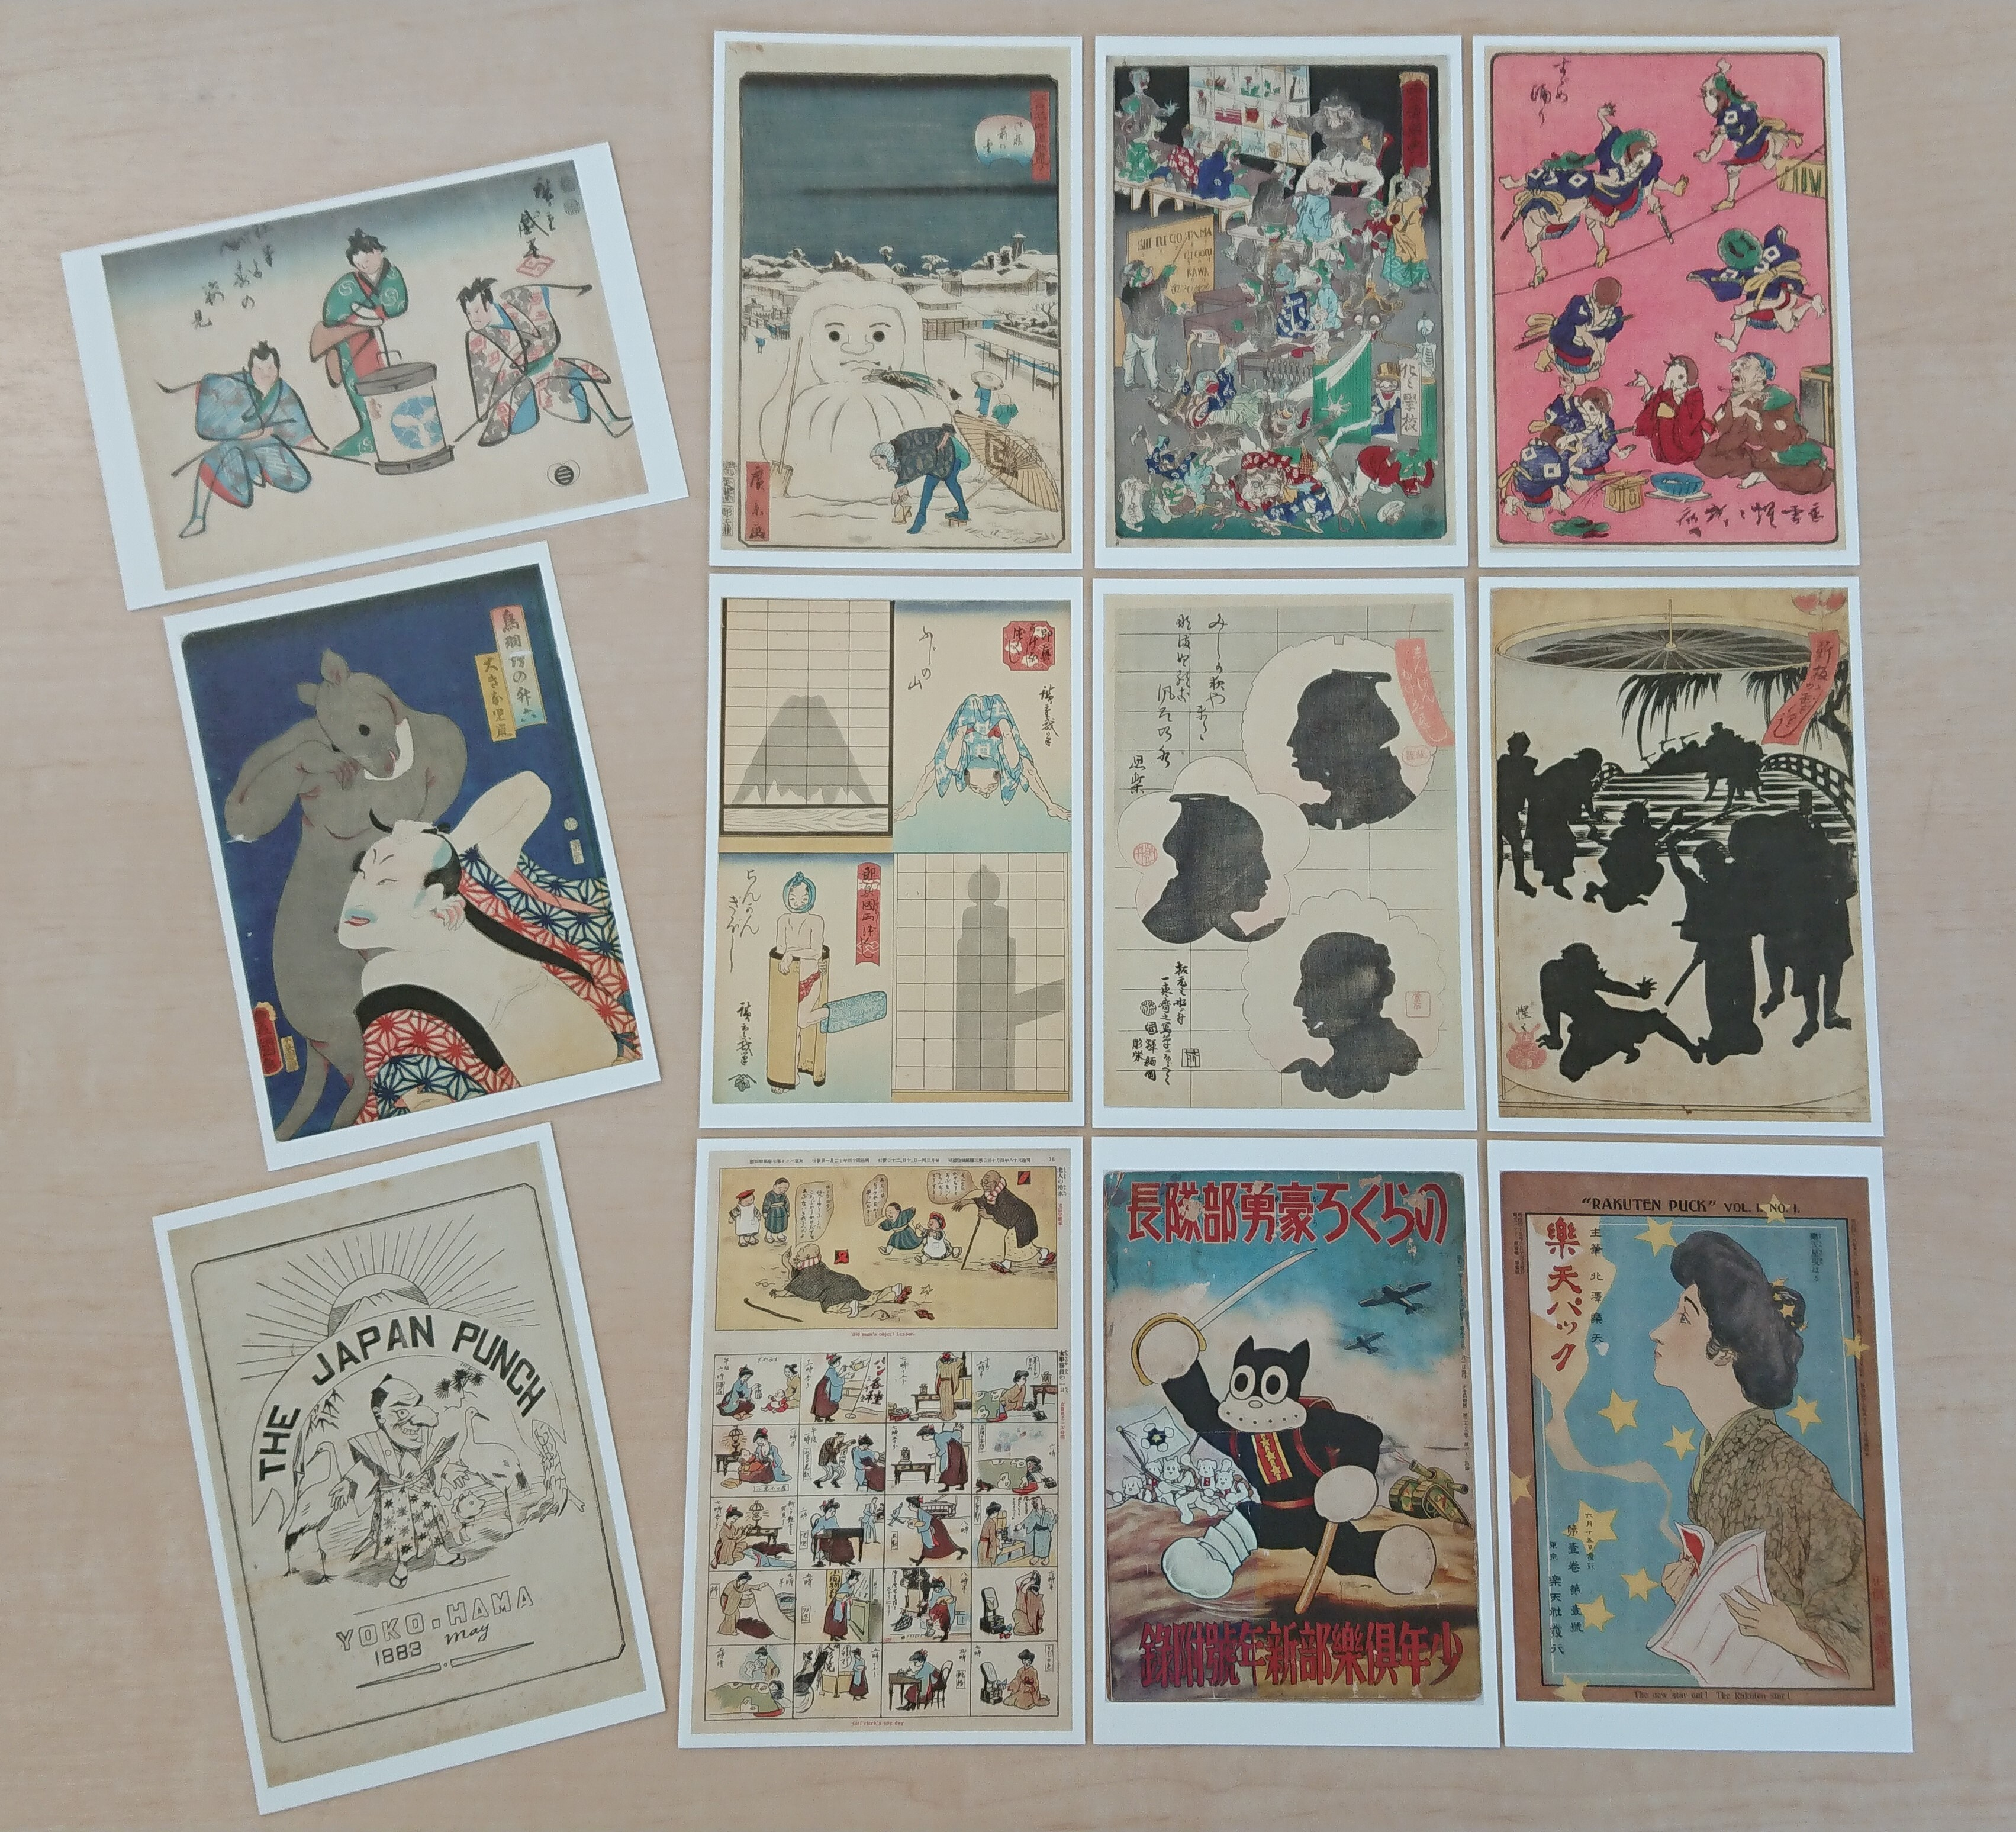 GIGA・MANGA 江戸戯画から近代漫画へ ポストカード (B)セット